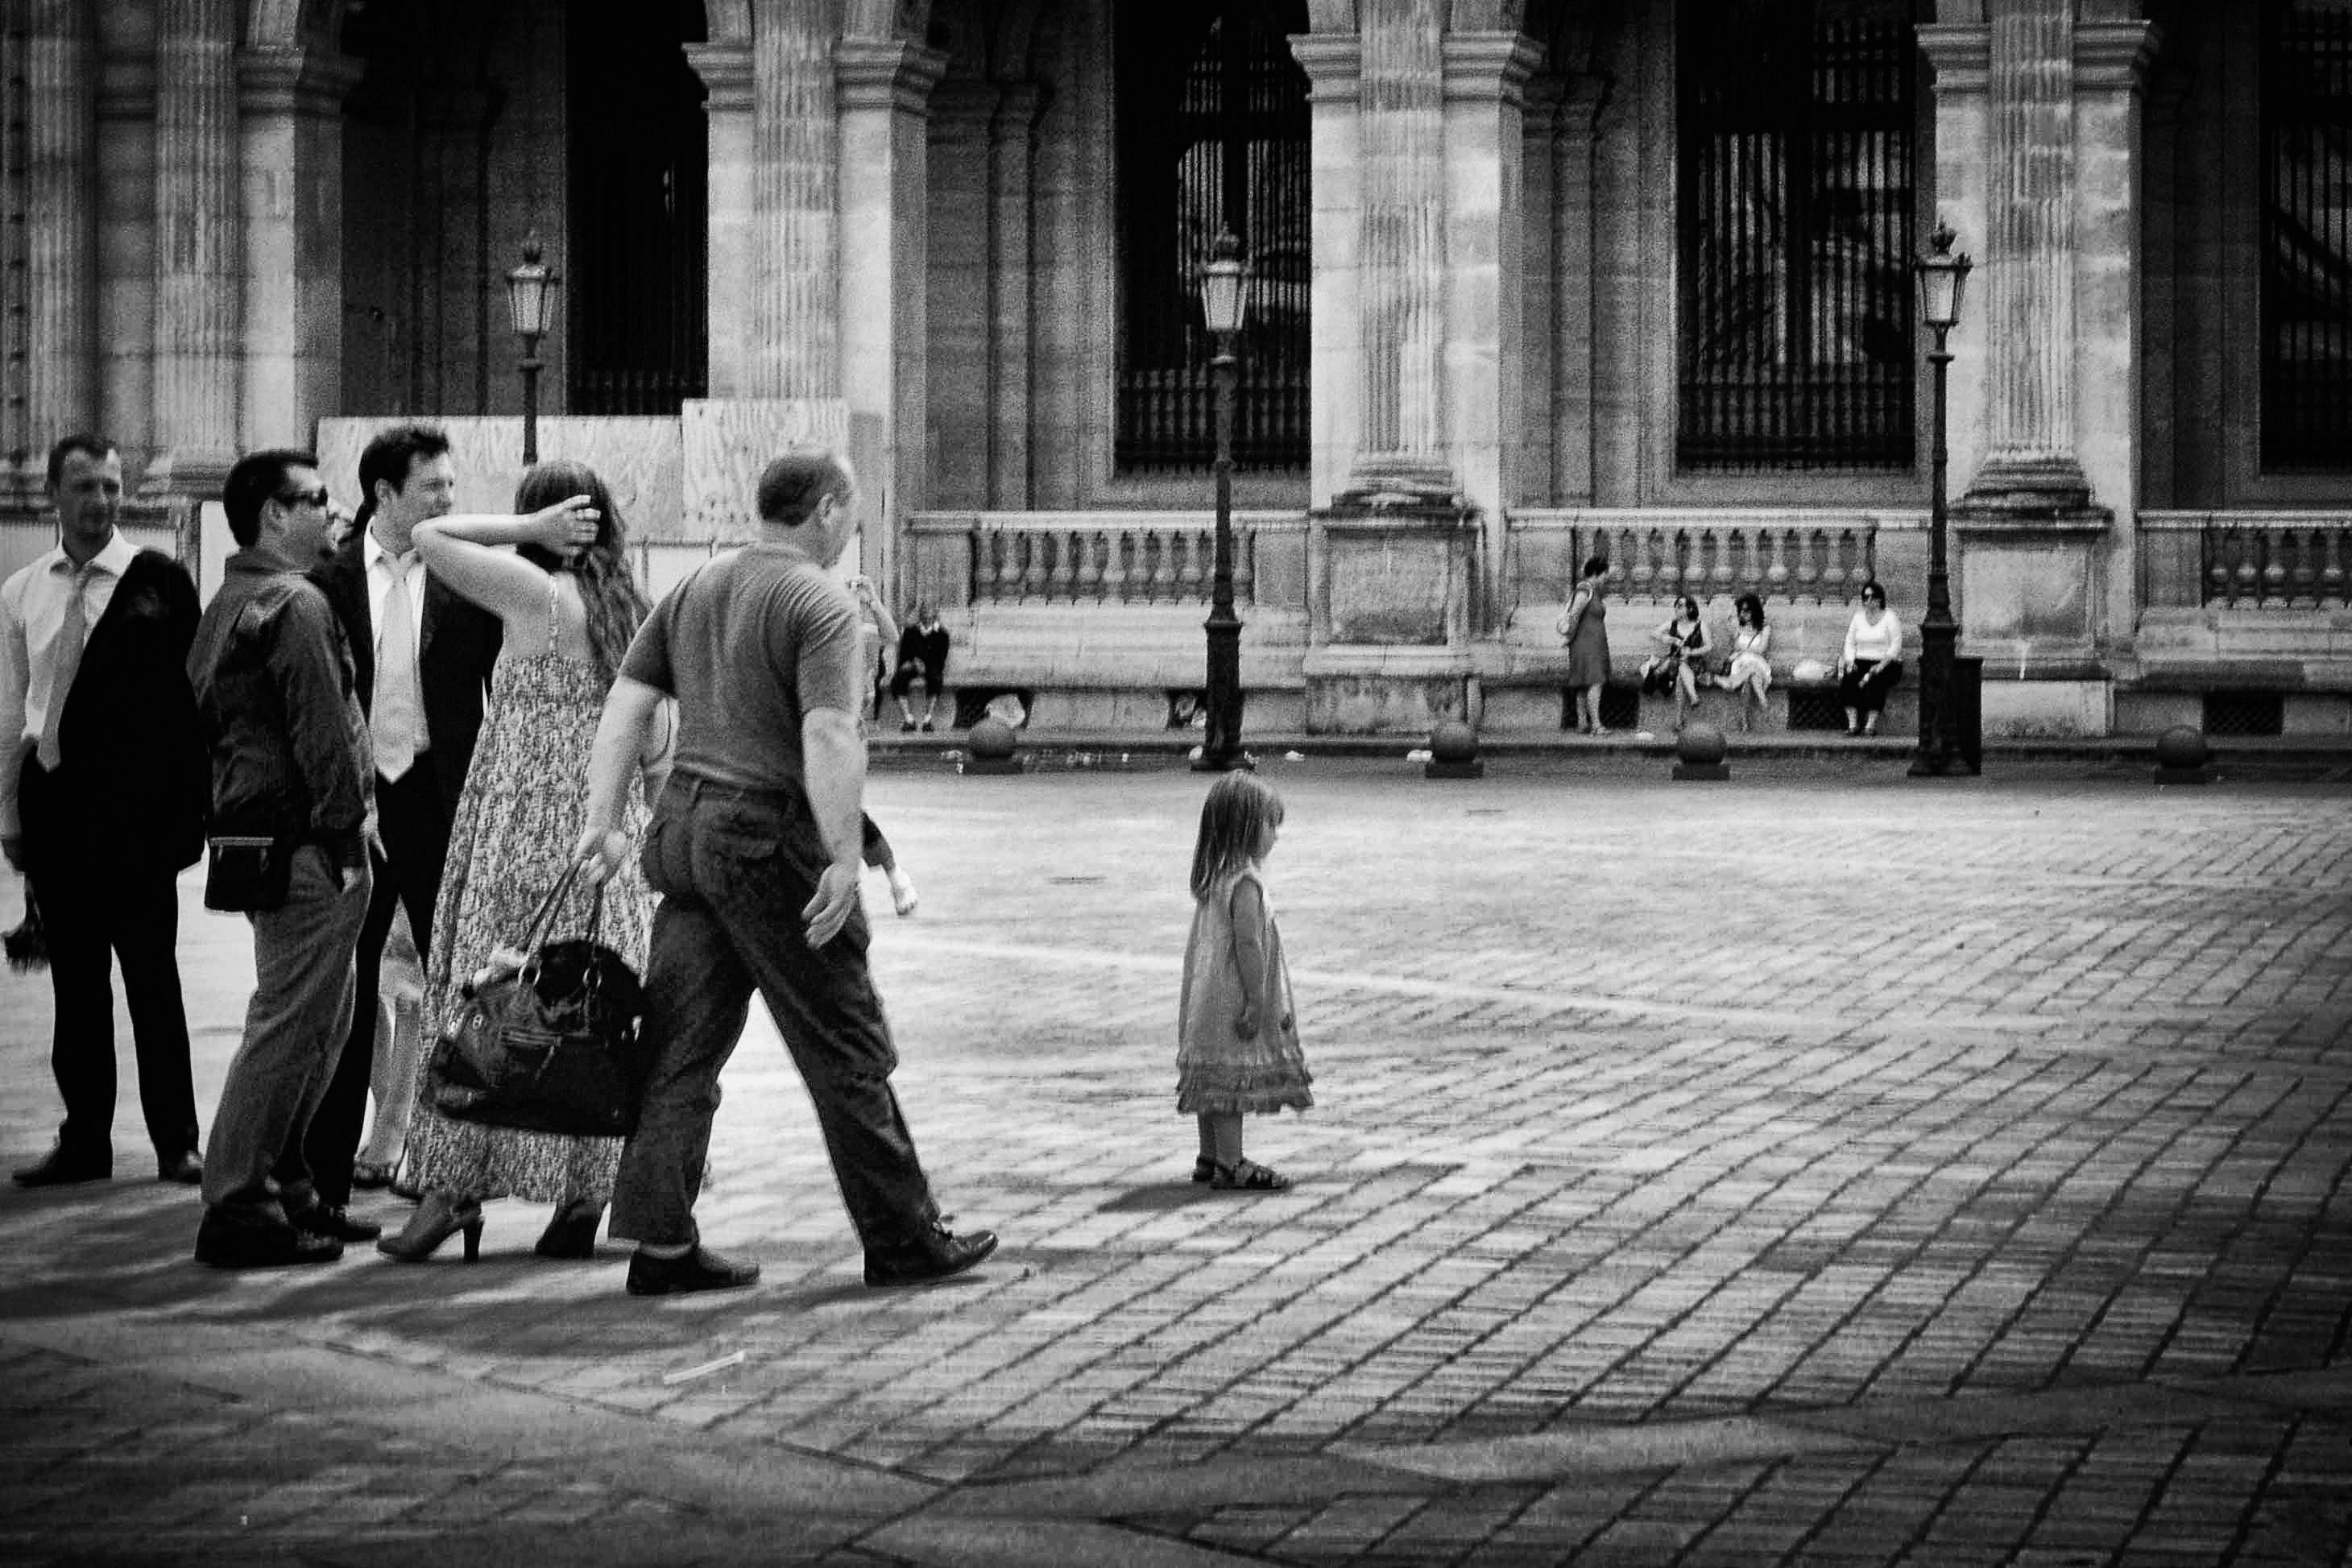 © Romaric Cazaux